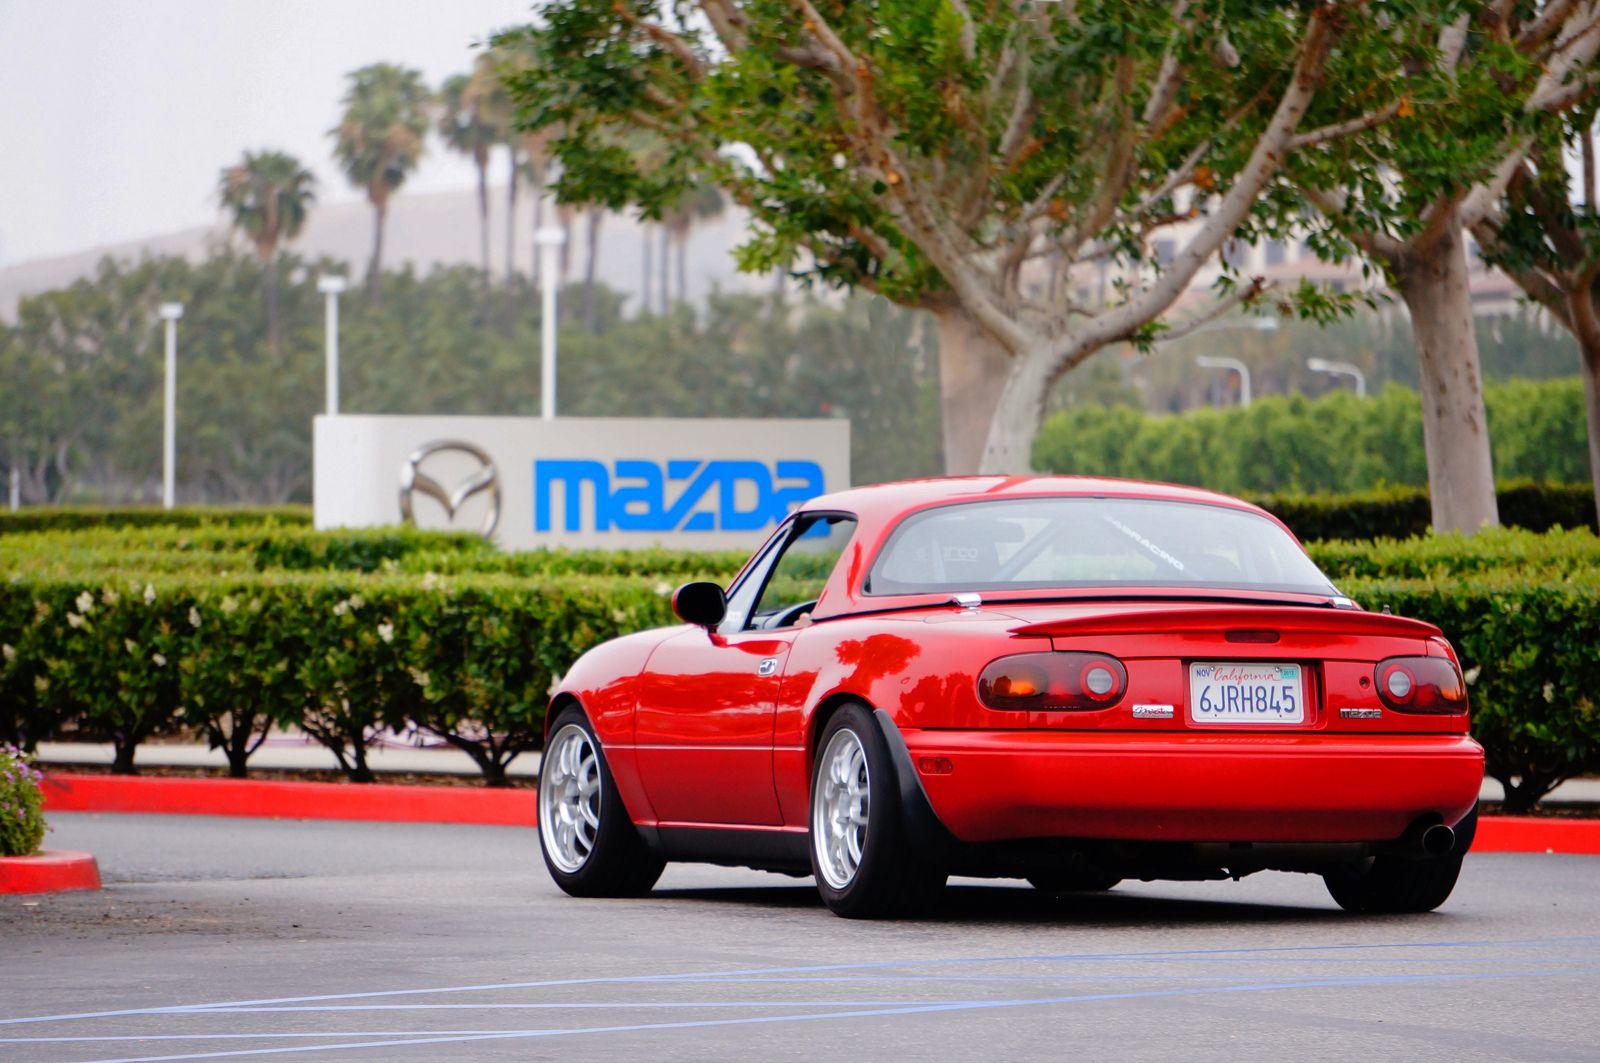 Mazda Miata Mazda Mx5 Miata Mazda Mx5 Miata